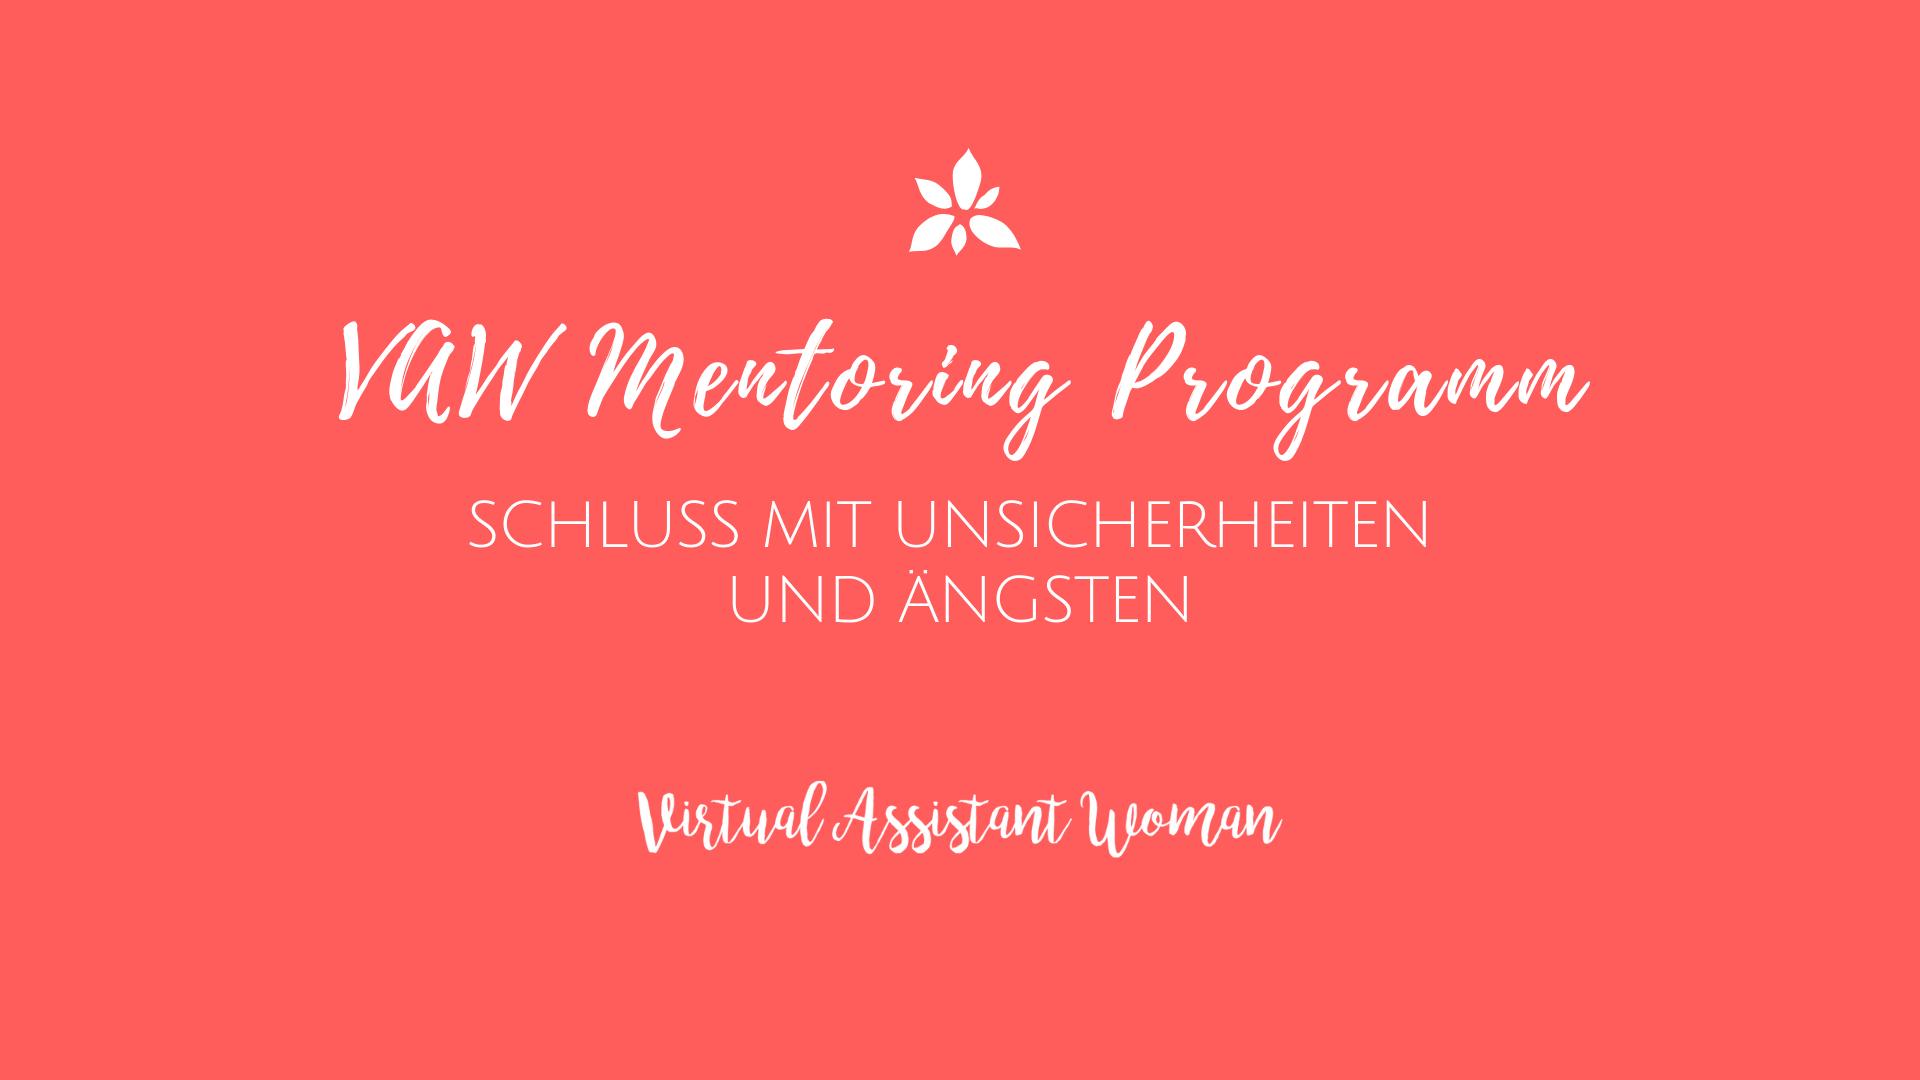 virtuelle assistentin mentoring Programm